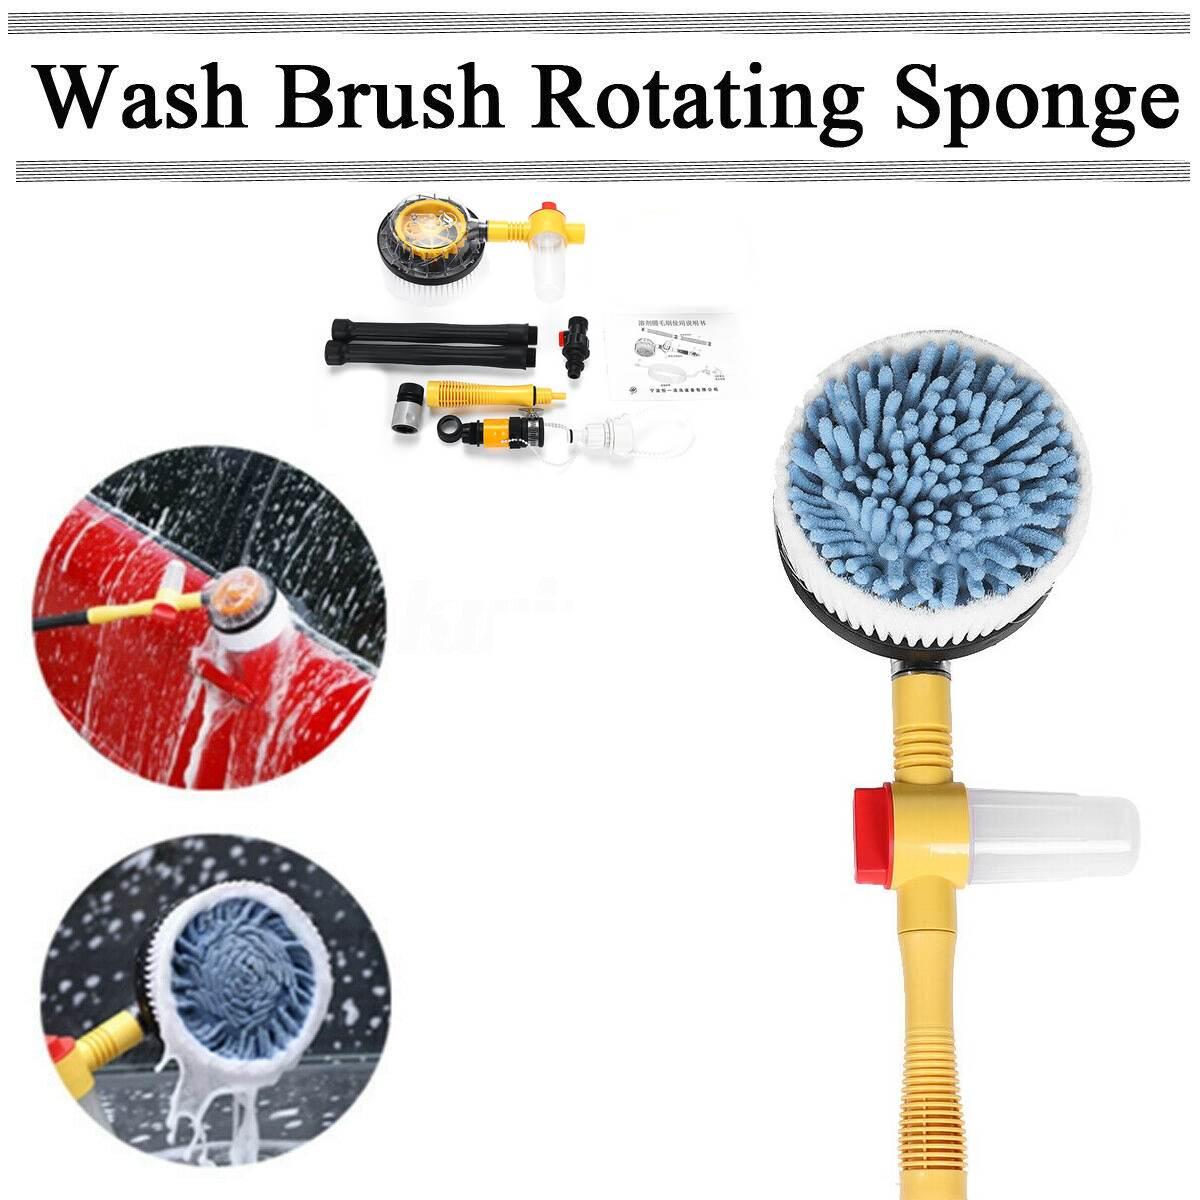 1 Set Car Washing Brush Tool Set Professional Spray Rotating Brush Portable Automatic Cleaning Tool Washing Switch Water